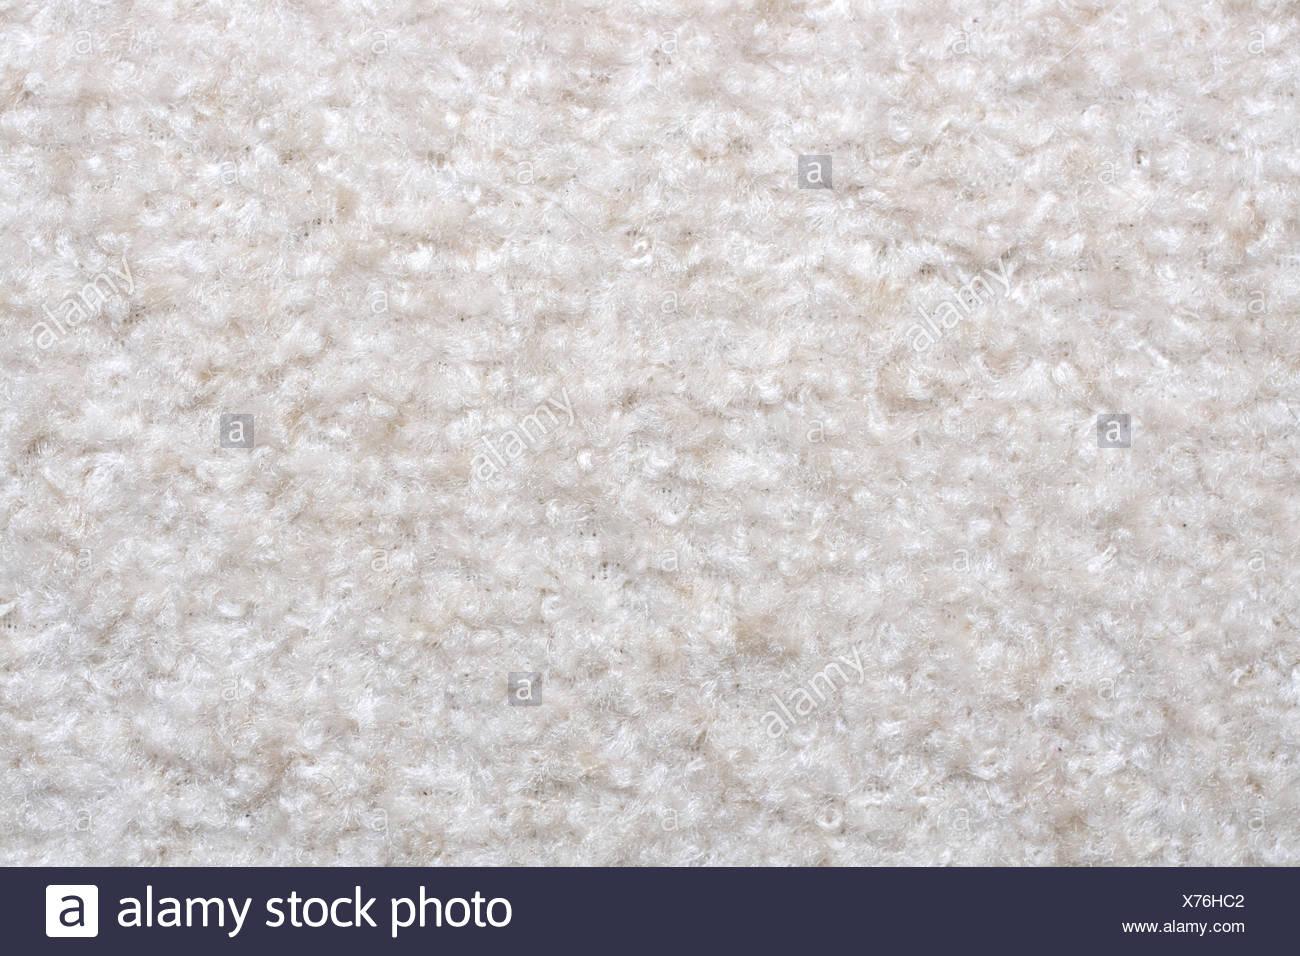 Gray Carpet Fabric Pattern Stock Photos & Gray Carpet ...